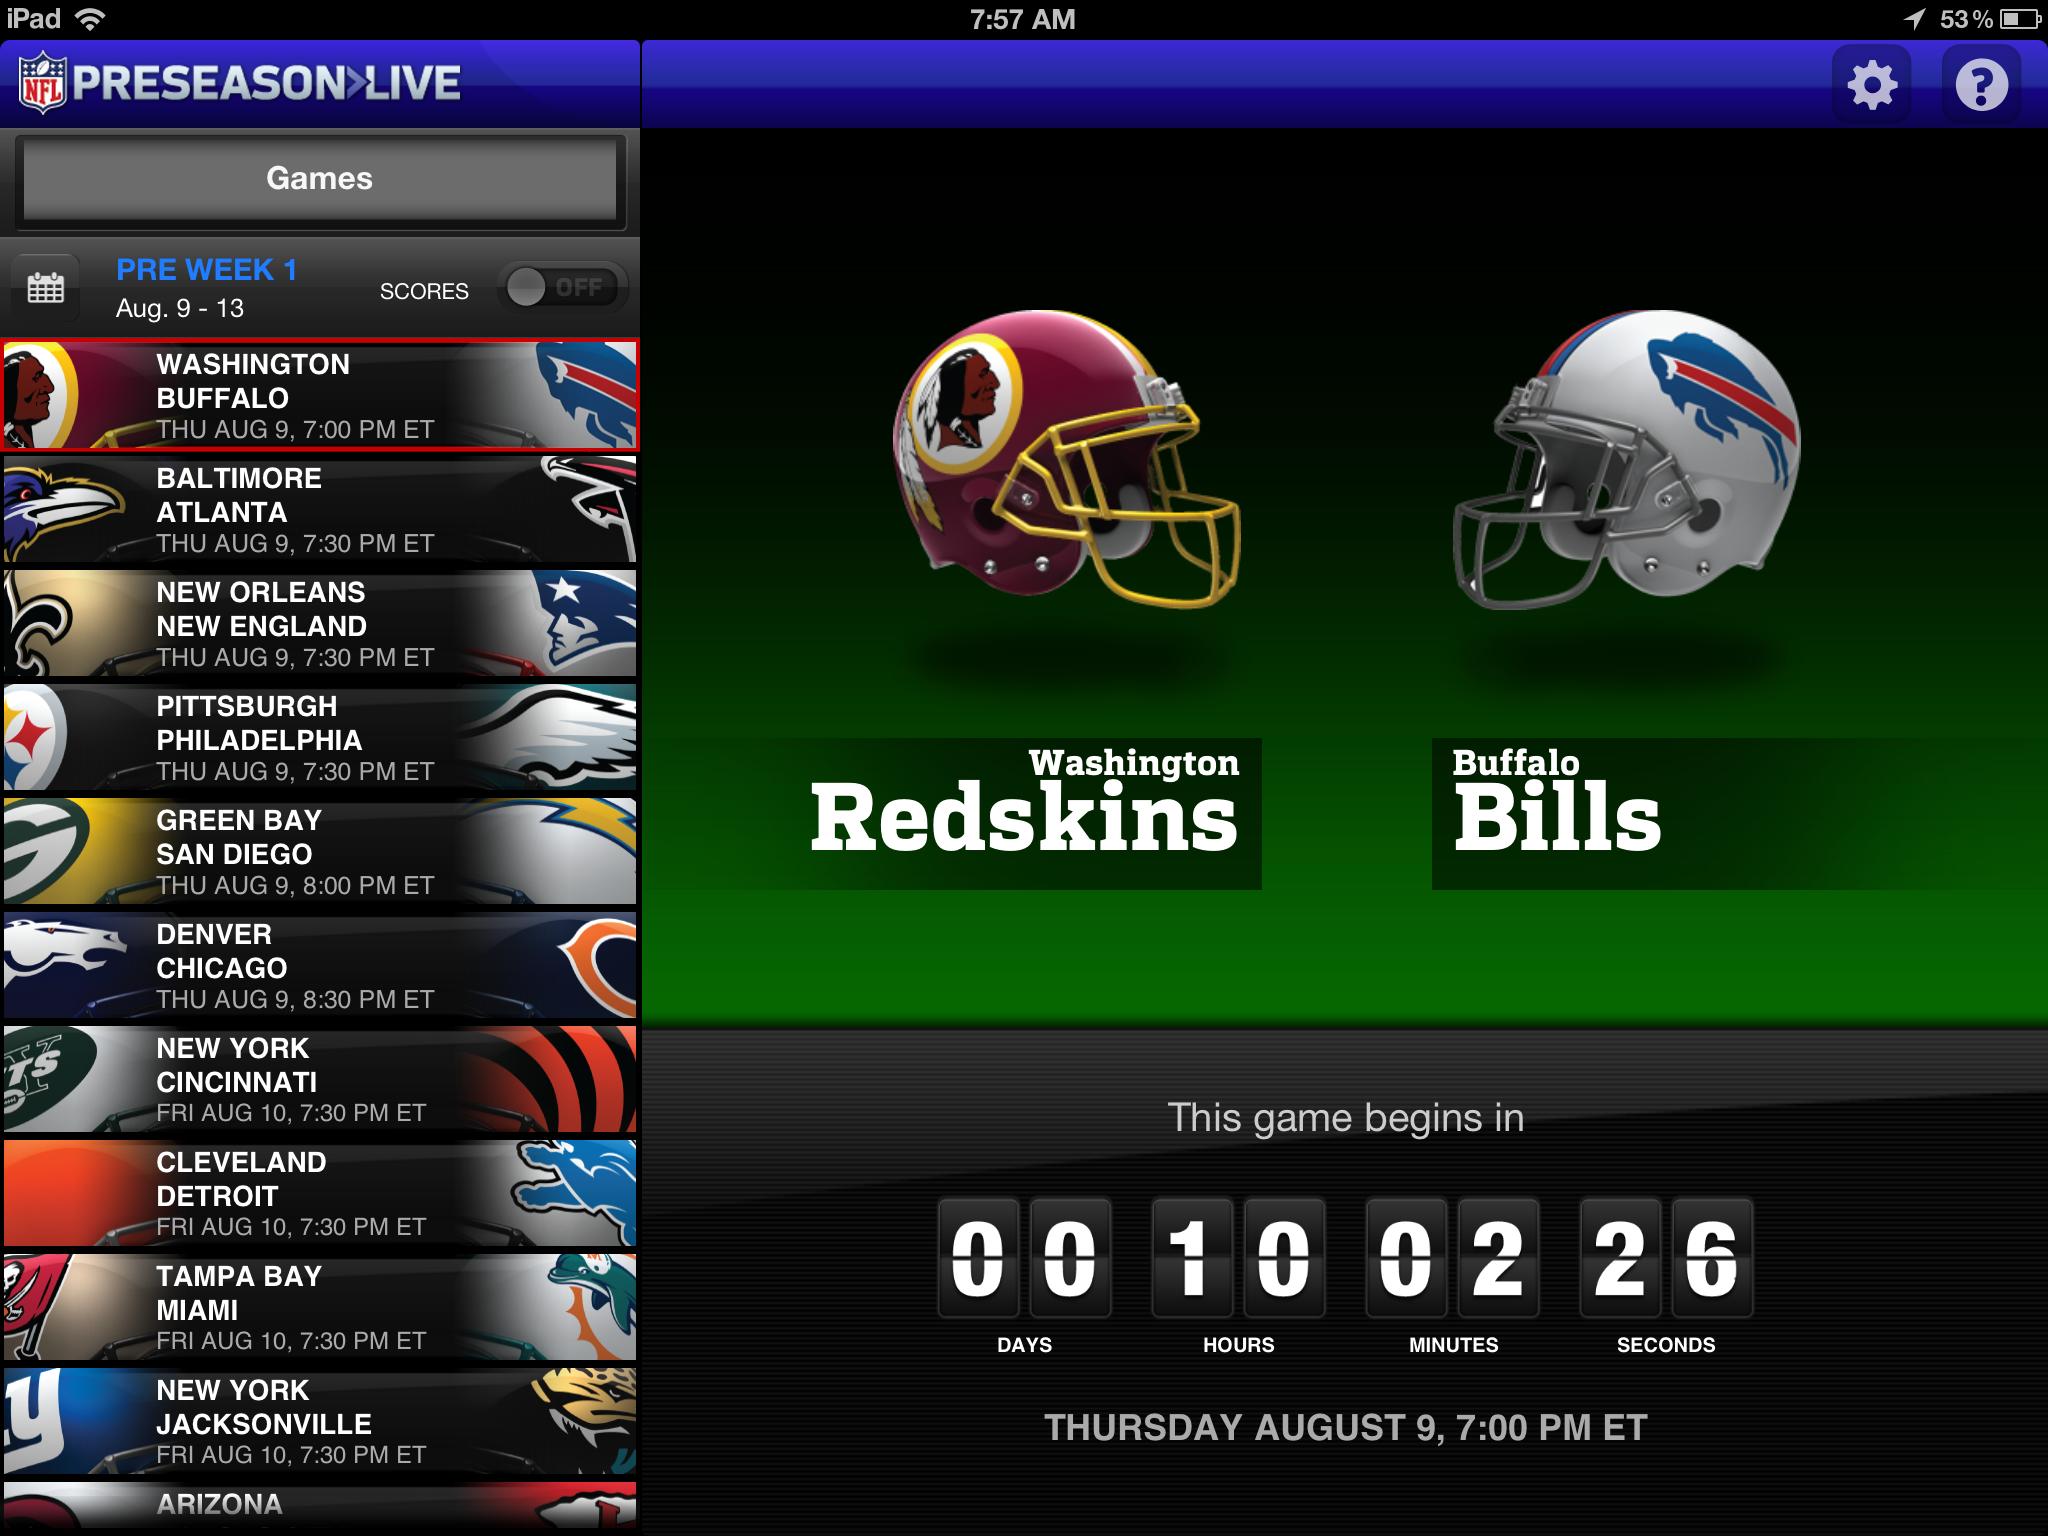 iOSDocked - EP024 - In All Siri-isness/i-Like NFL Preseason Live for iPad